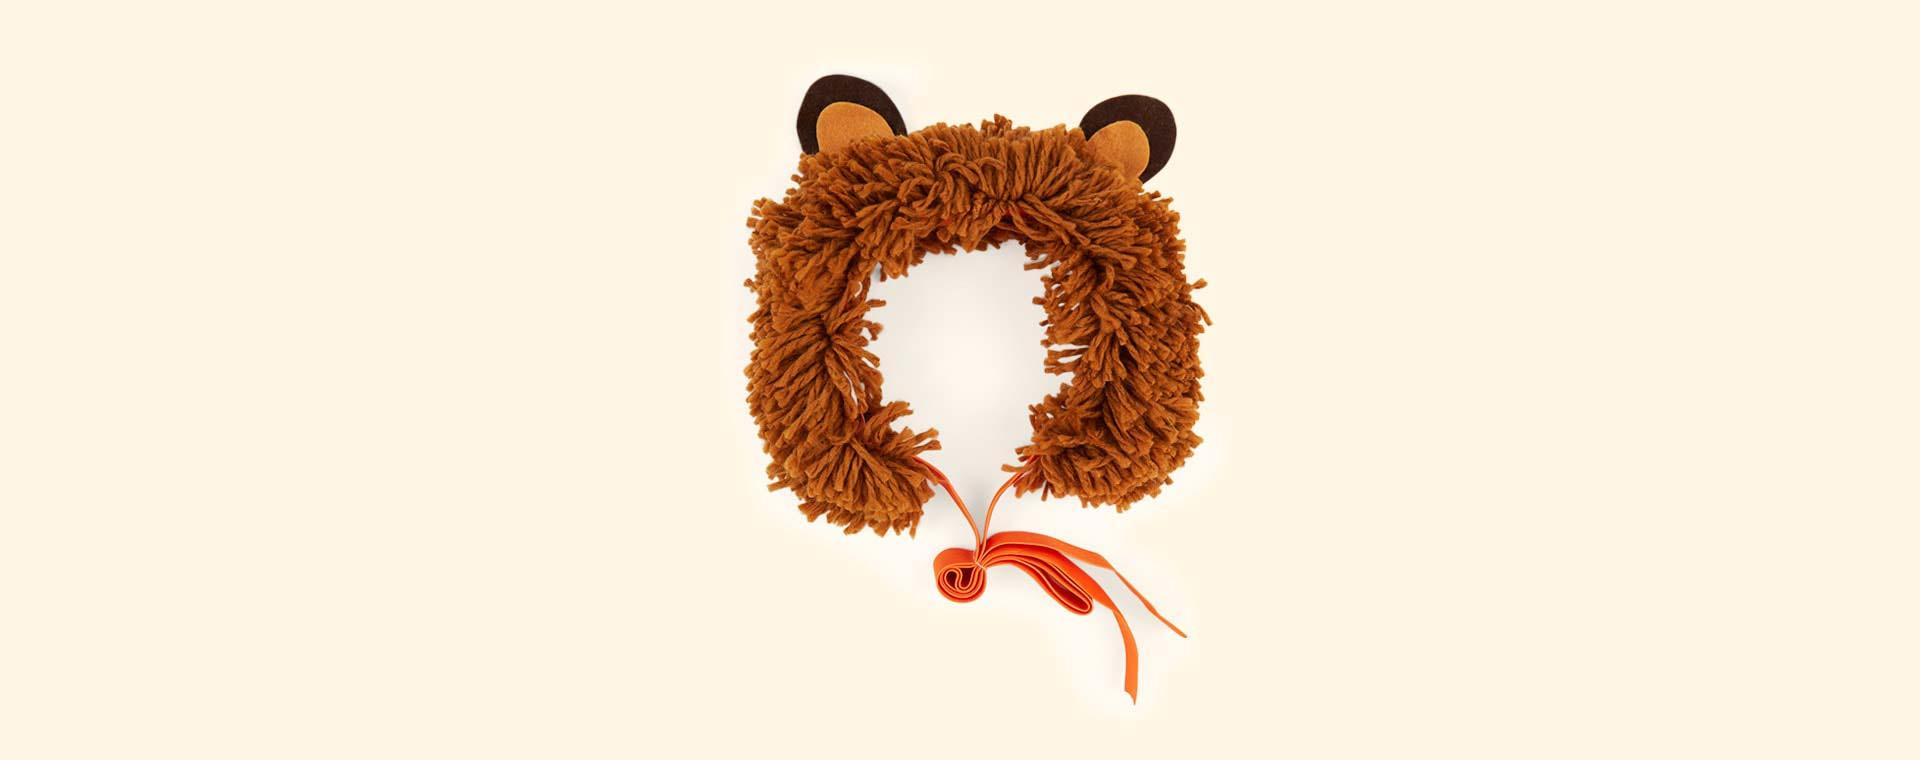 Buy The Meri Meri Wearable Lion Mane At Kidly Usa